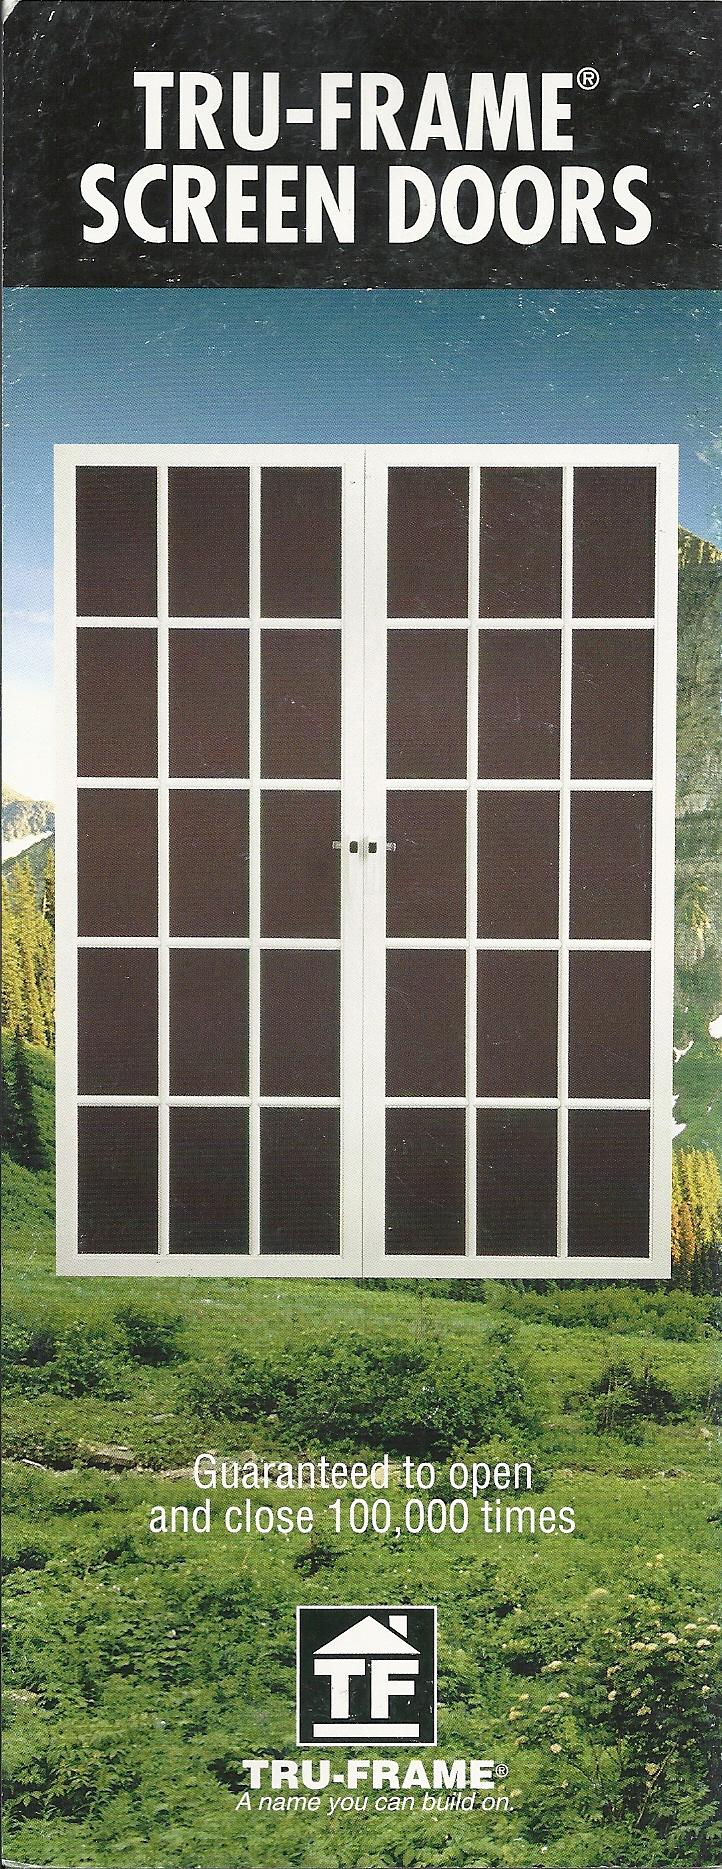 Products for Screen door options